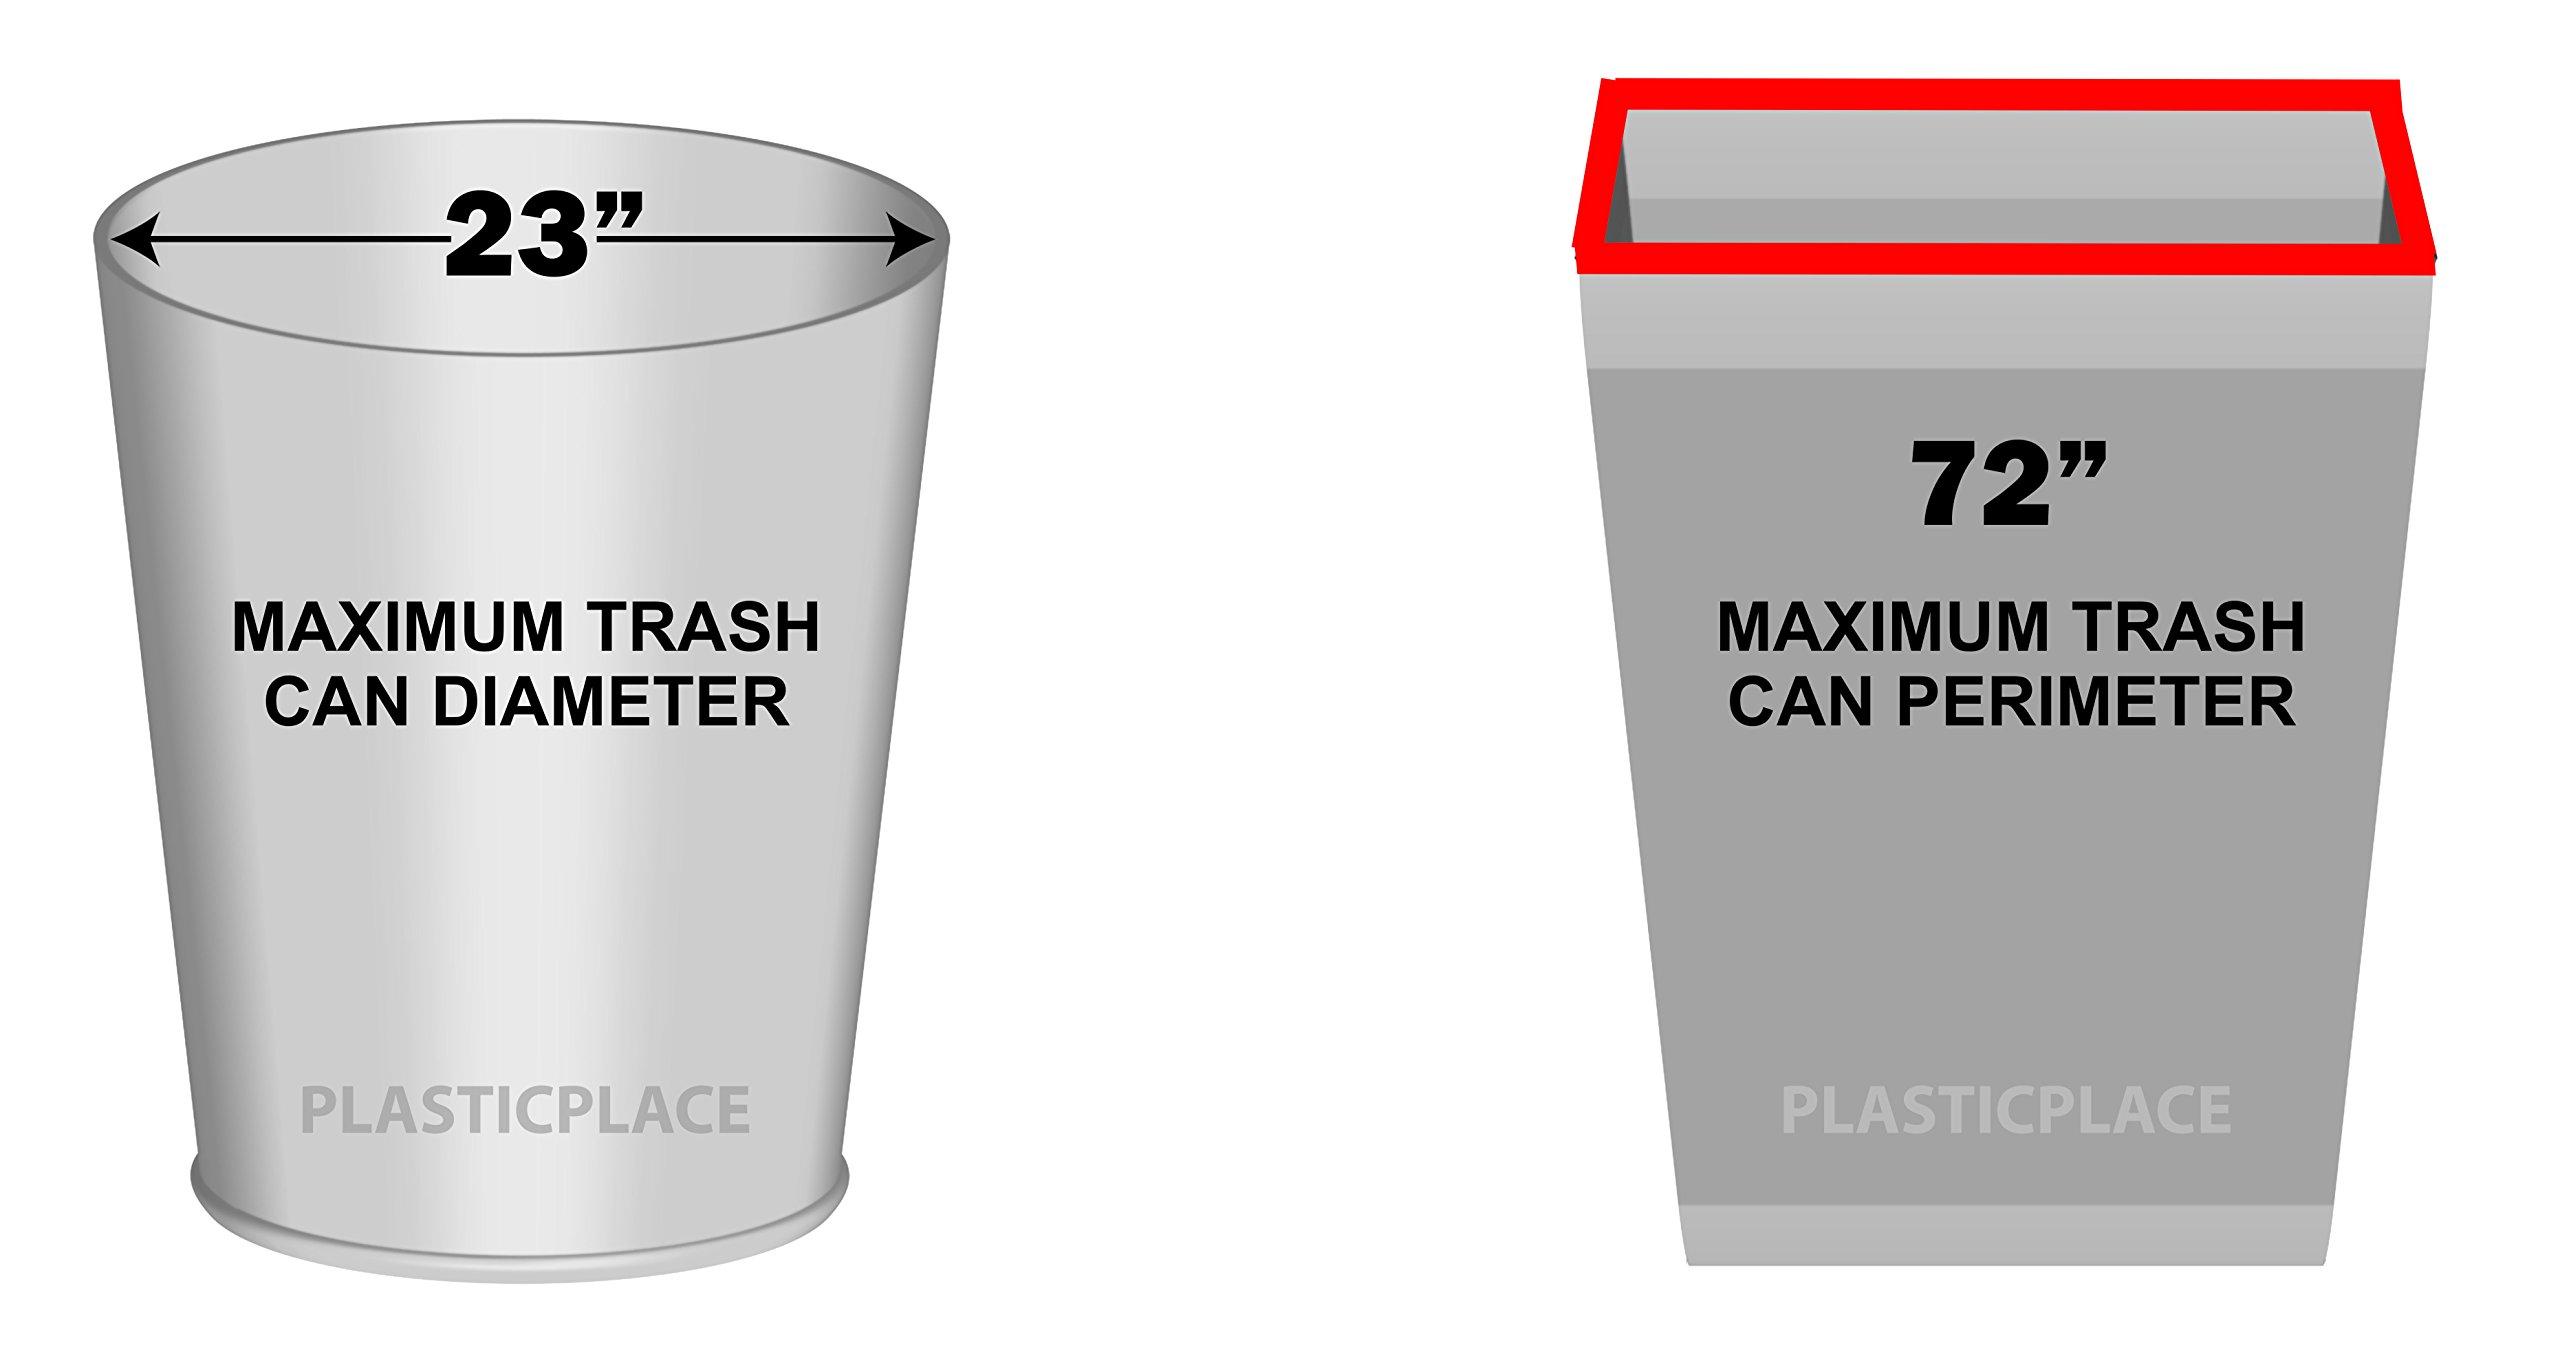 Plasticplace 55-60 Gallon Contractor Bags, 6.0 Mil, 36''W x 58''H, Black, 20/Case